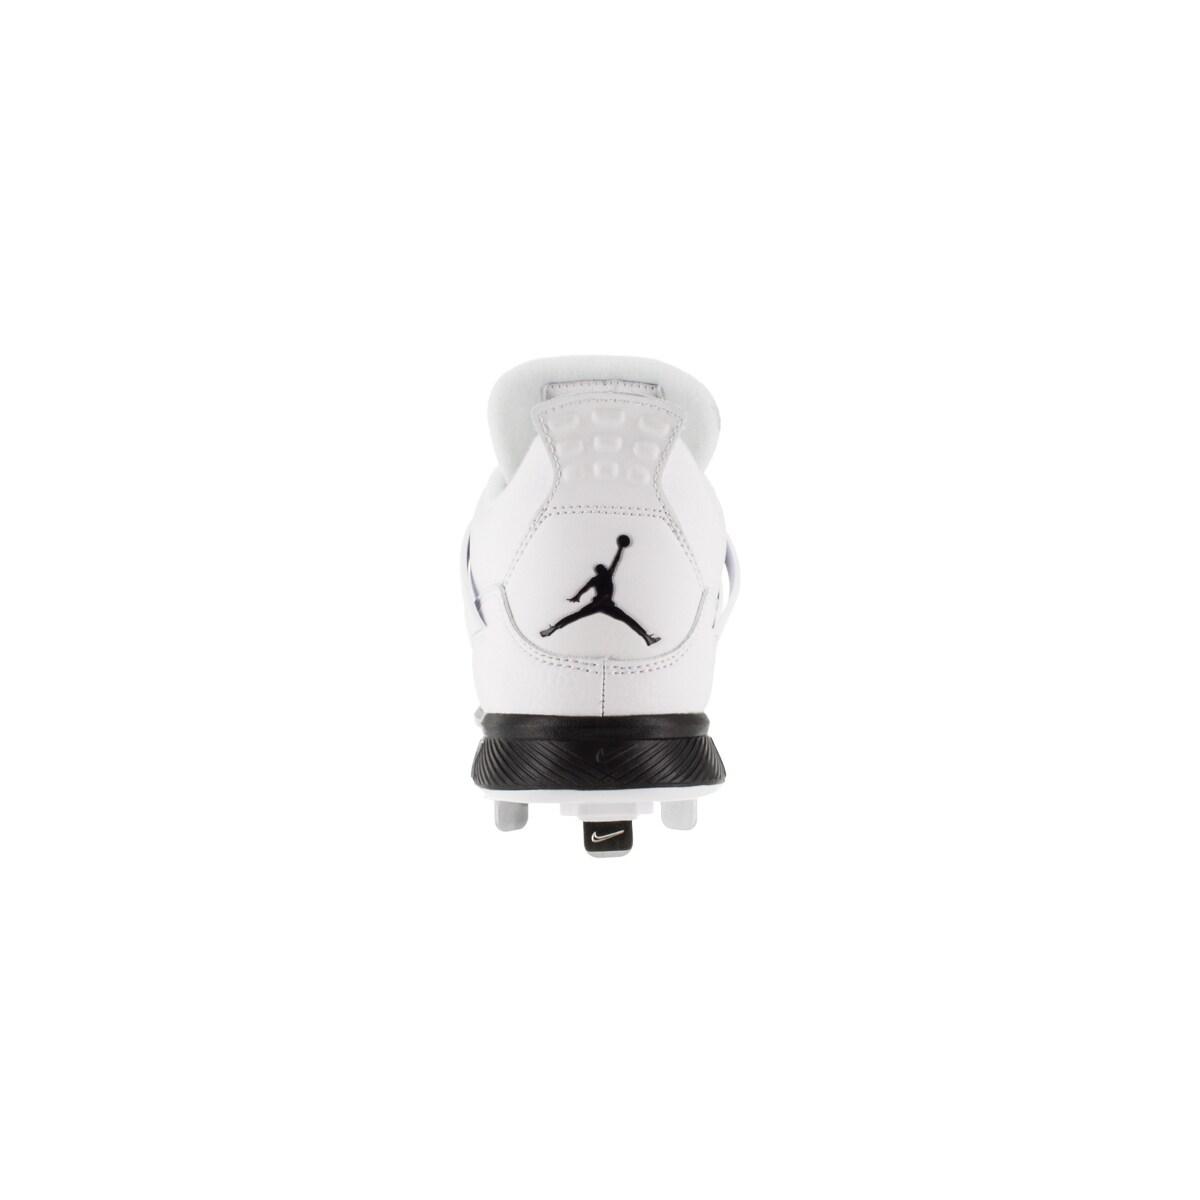 big sale 36436 1a6d1 Shop Nike Jordan Men s Jordan Iv Retro Metal White Black Baseball Cleat 8  Men s Us - Free Shipping Today - Overstock - 12318276